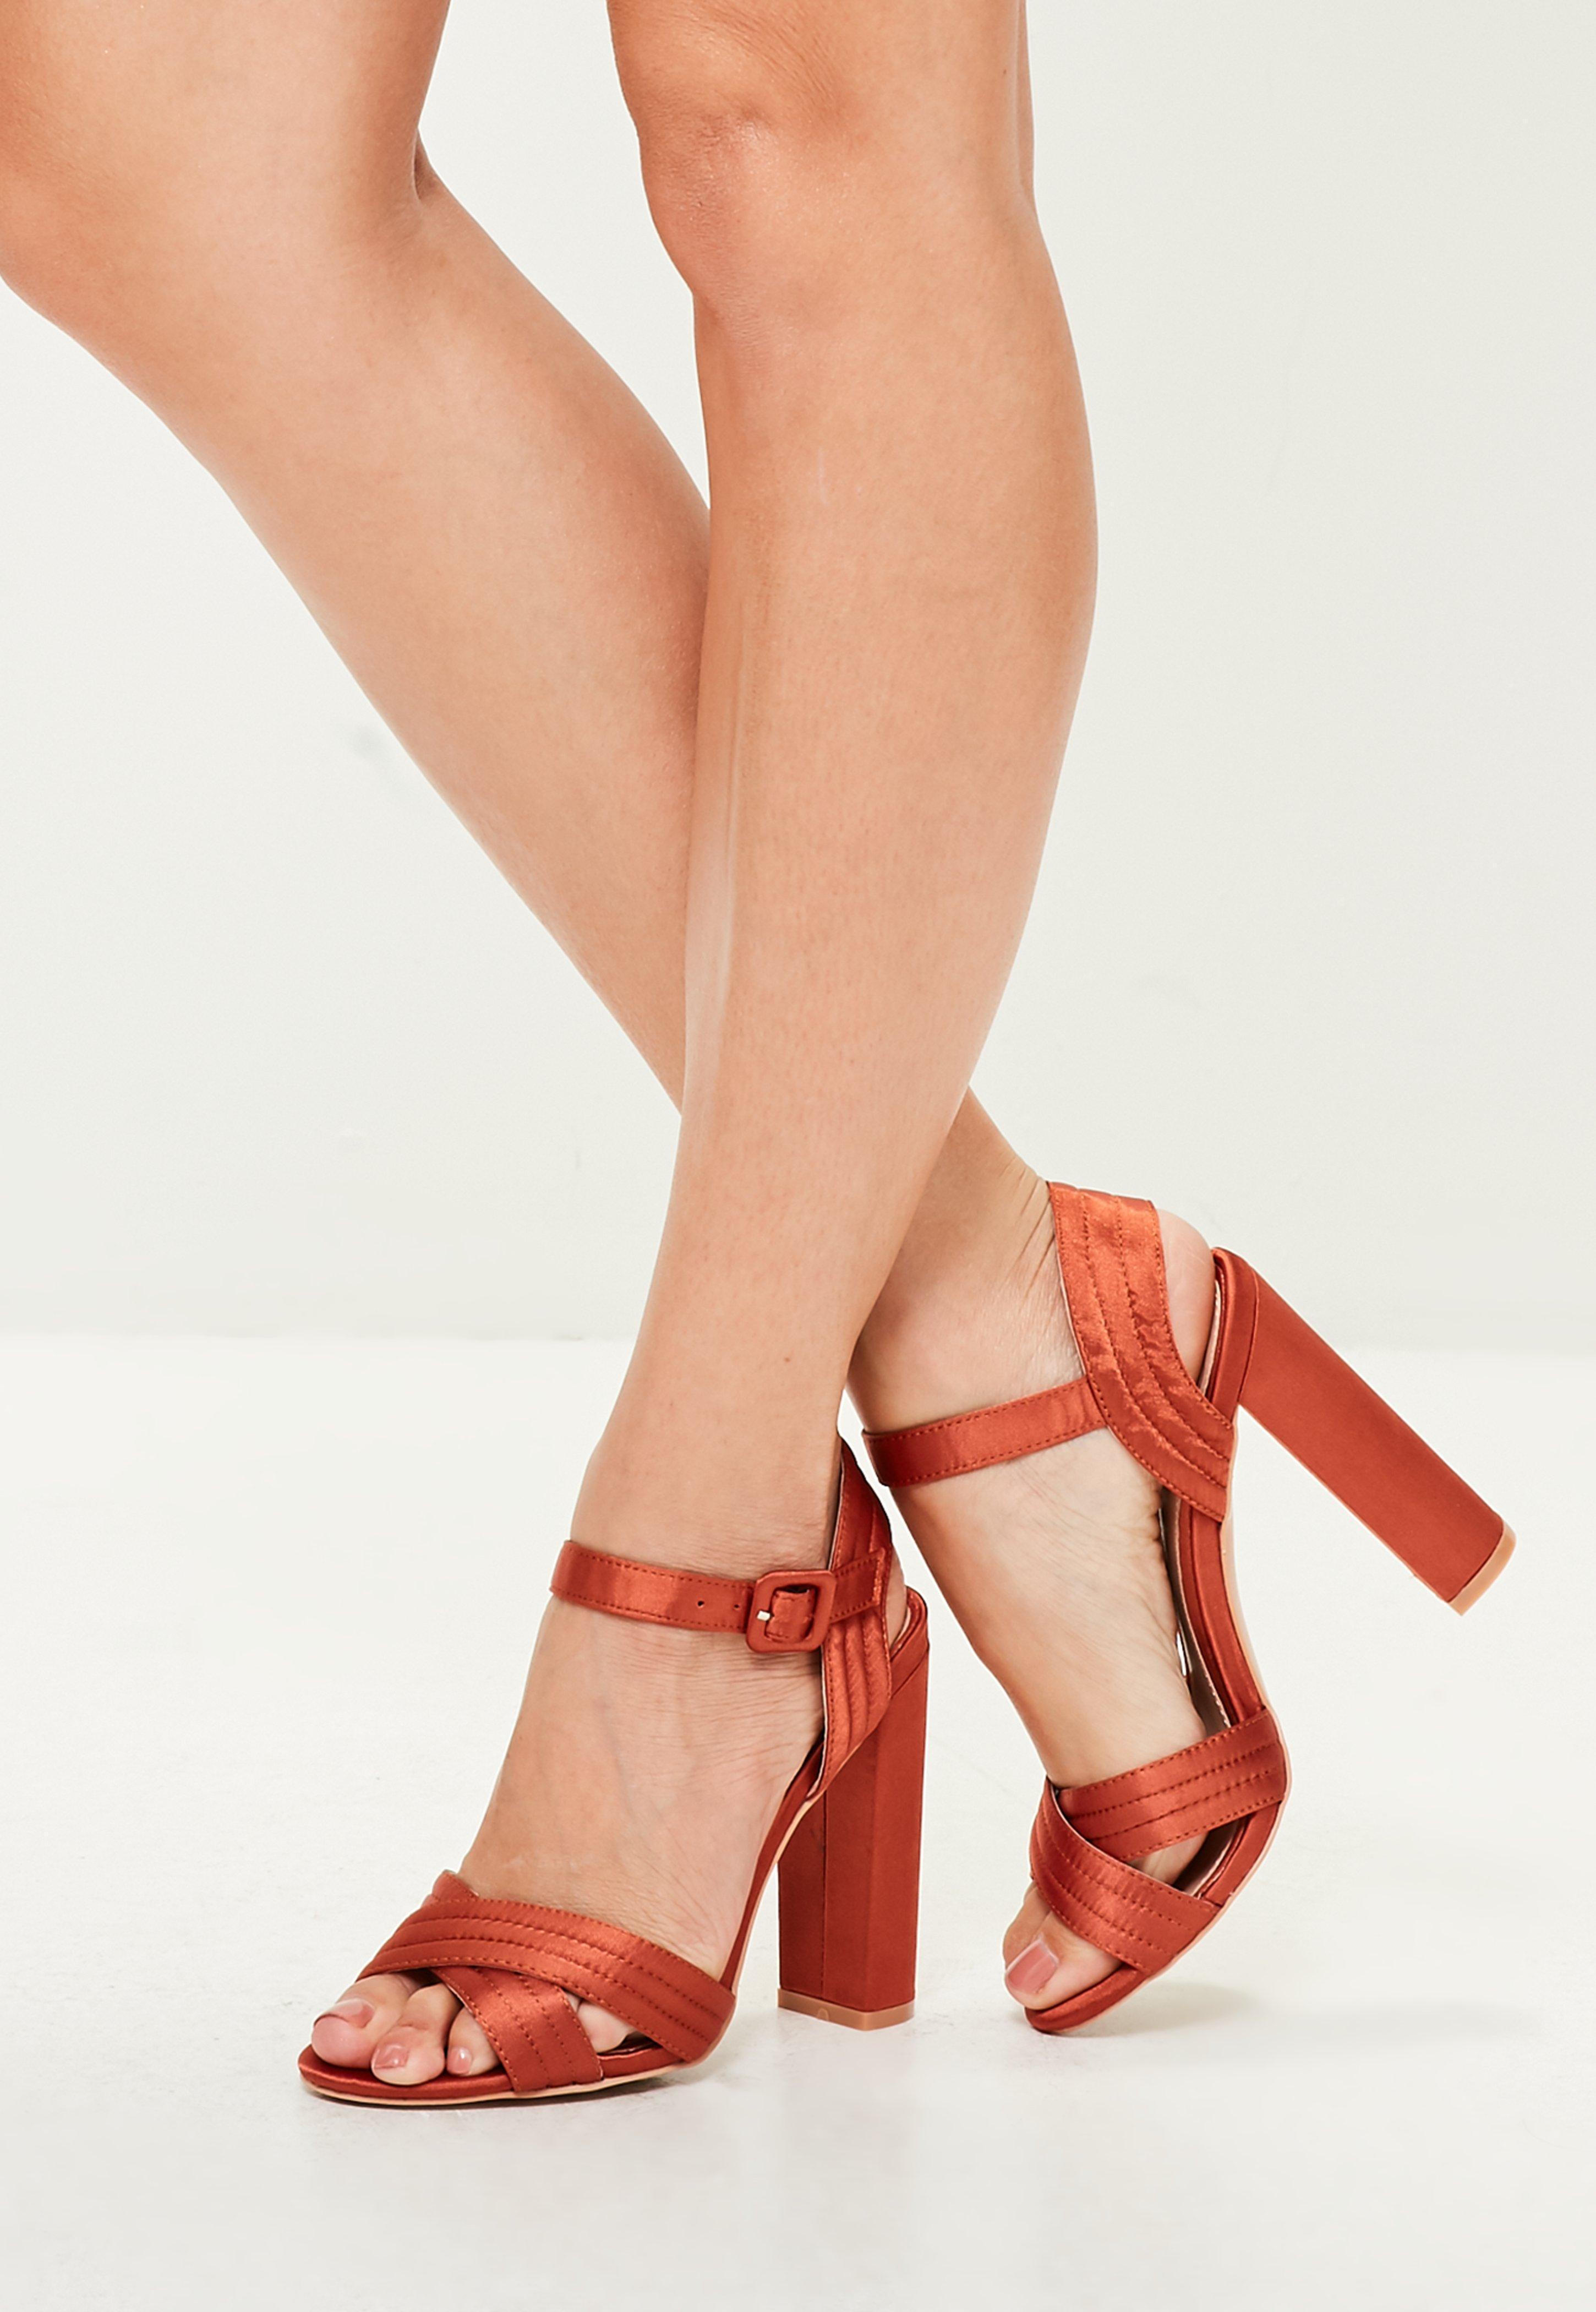 65fb0f8d8f8 Lyst - Missguided Orange Satin Cross Strap Heeled Sandal in Orange